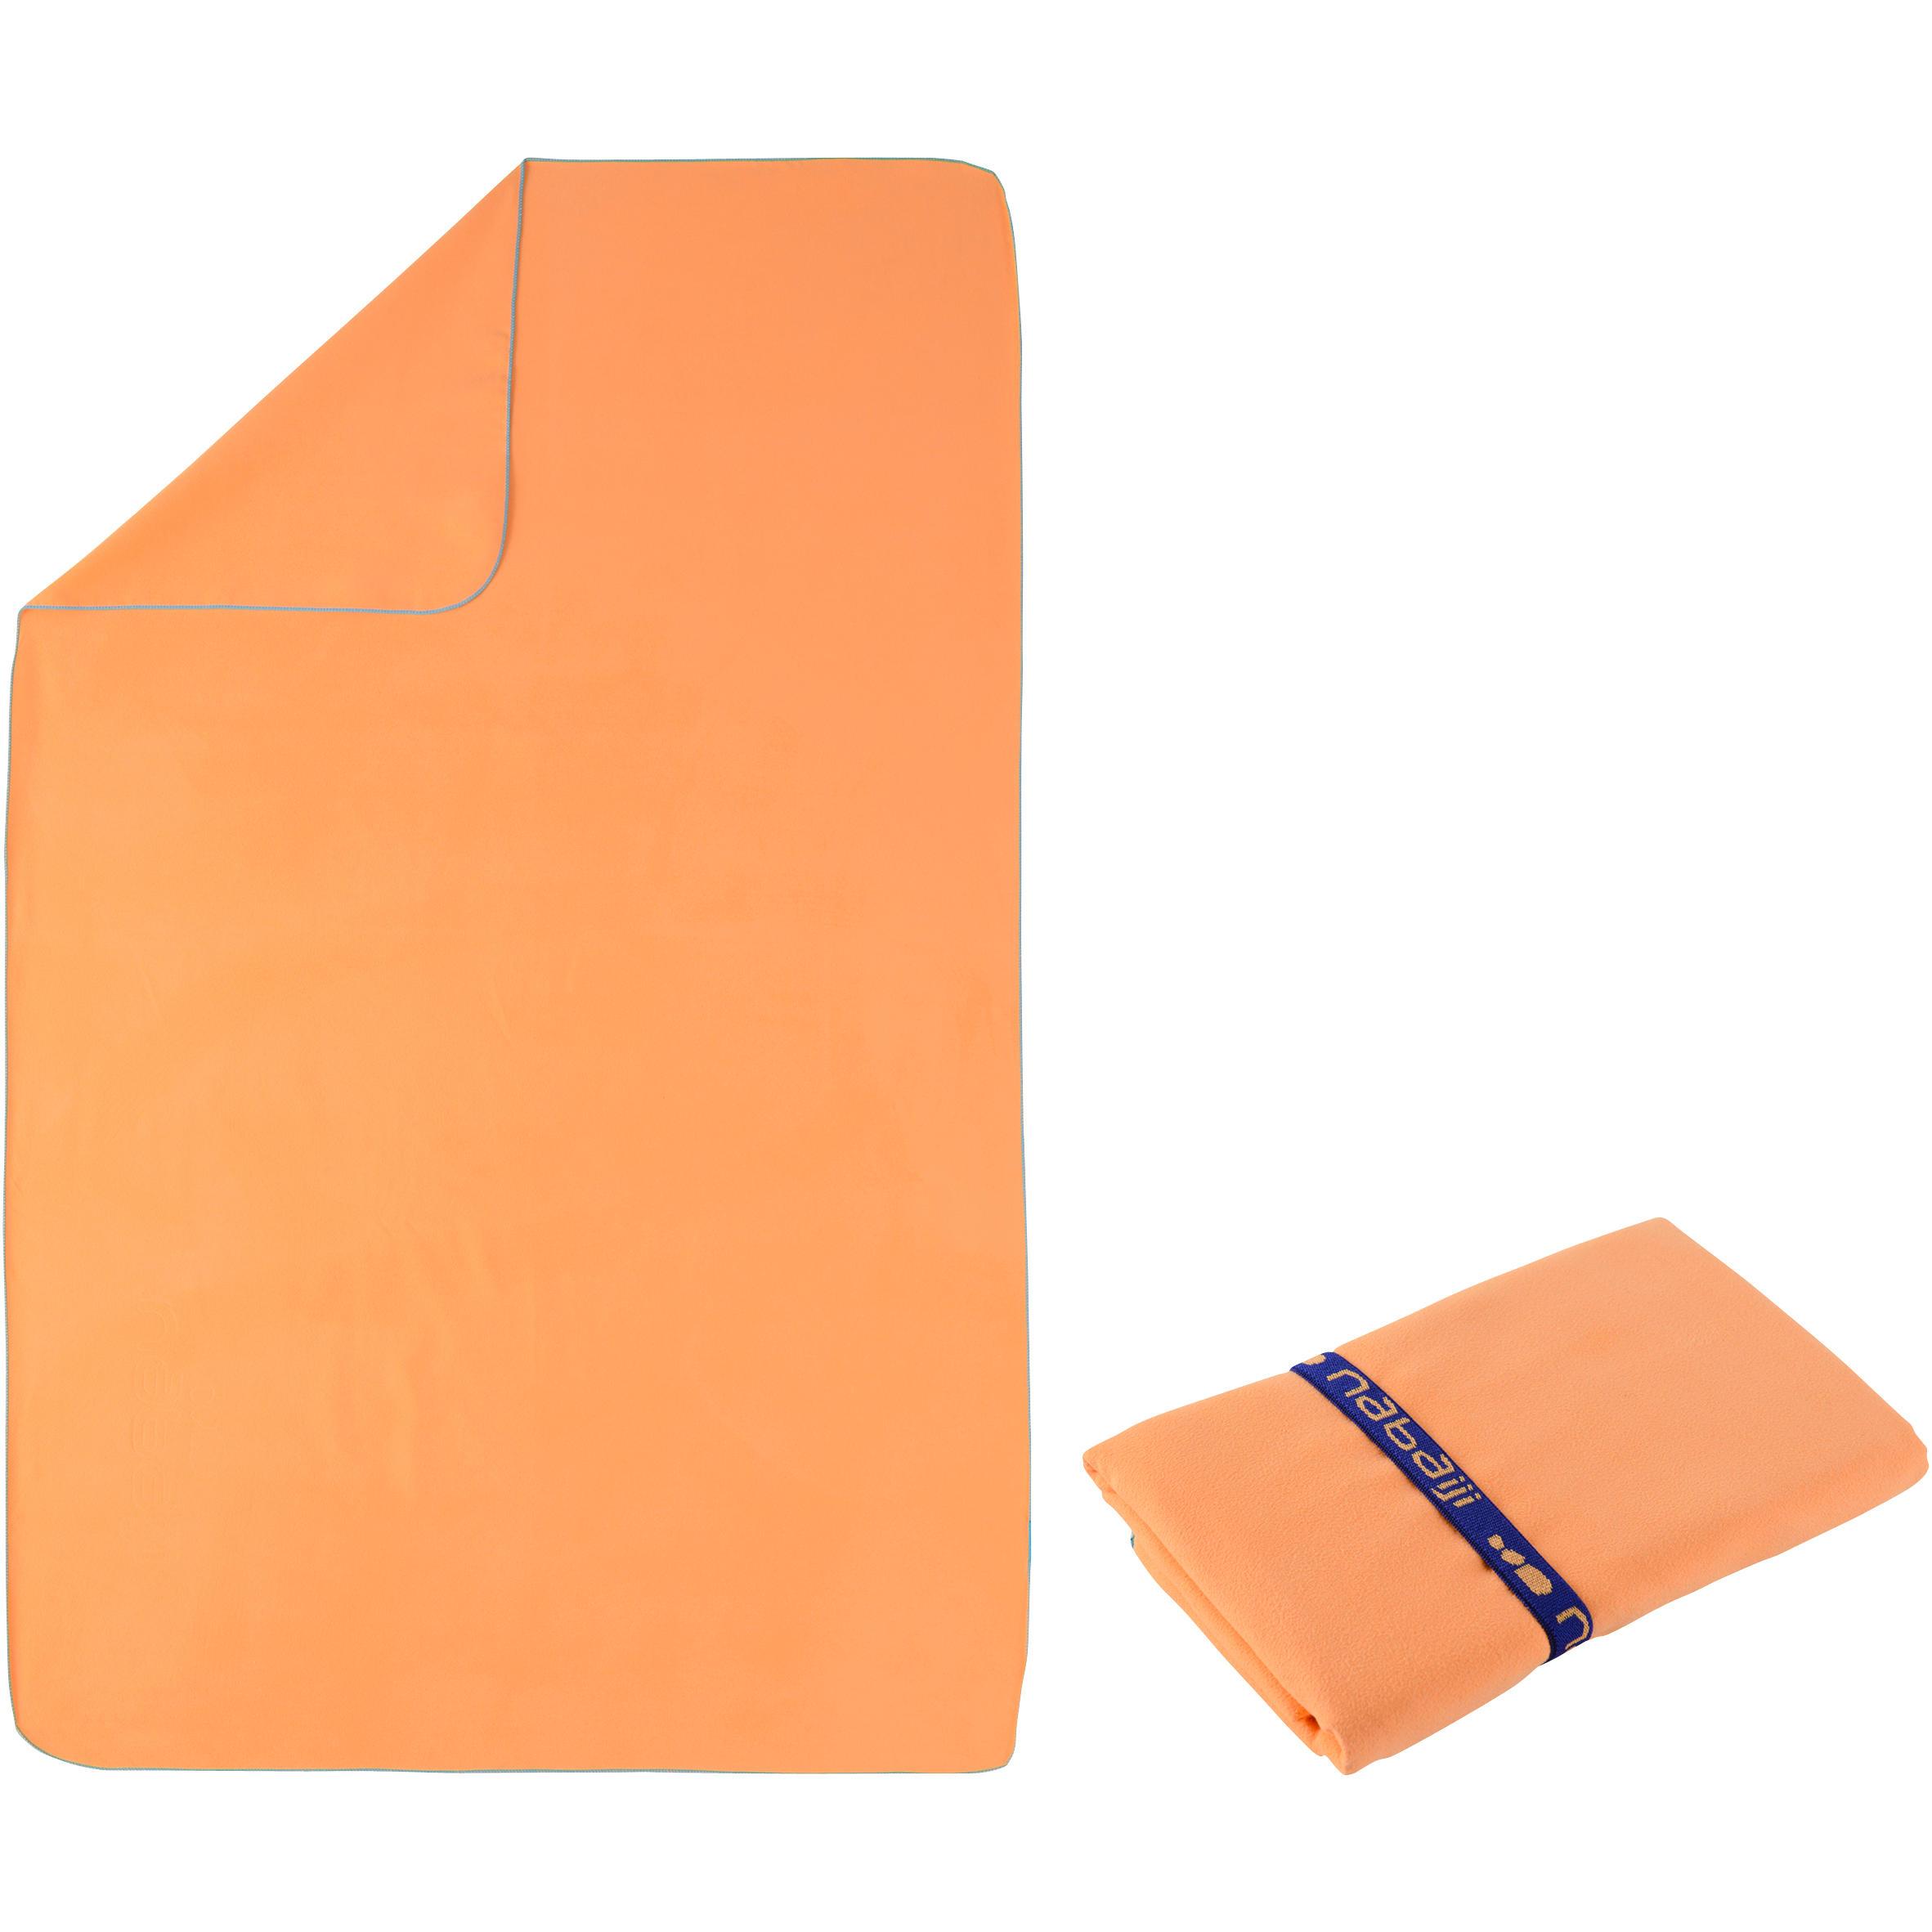 Toalla de microfibra naranja claro talla G 80 x 130 cm.